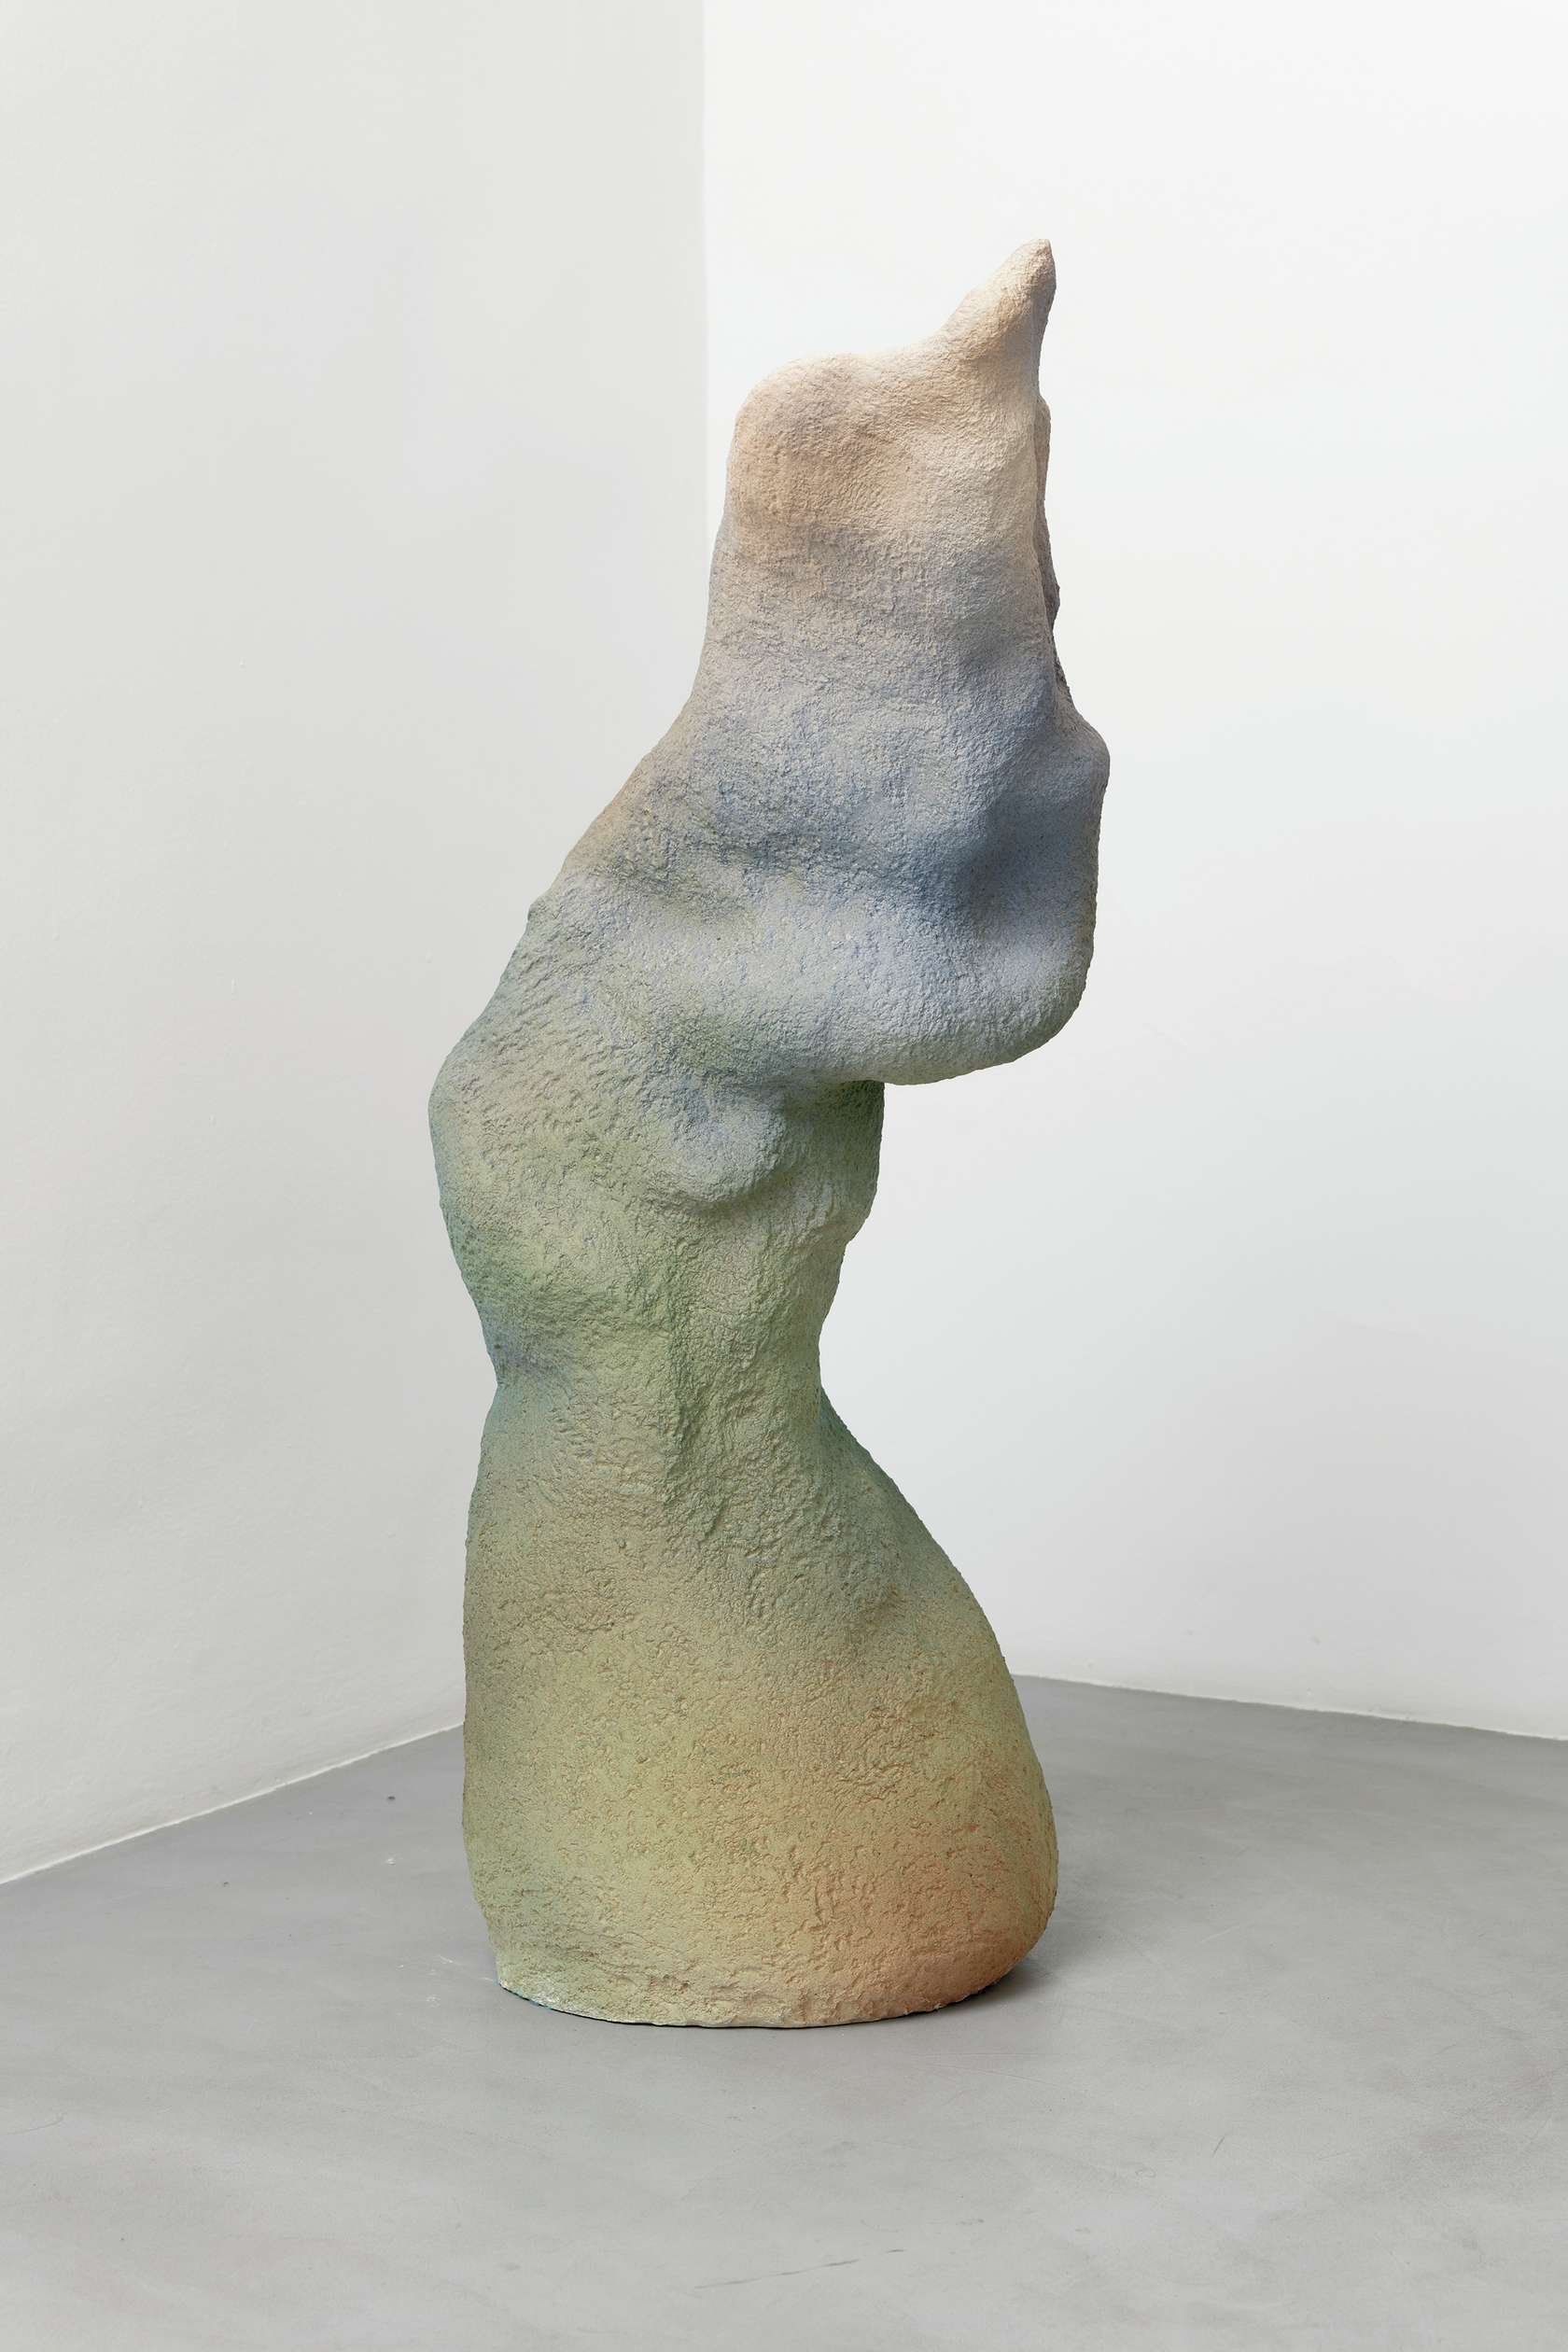 Salvatore Arancio, Lono, 2013 Céramique émaillée121 x 48 x 45 cm / 47 5/8 x 18 7/8 x 17 6/8 inches